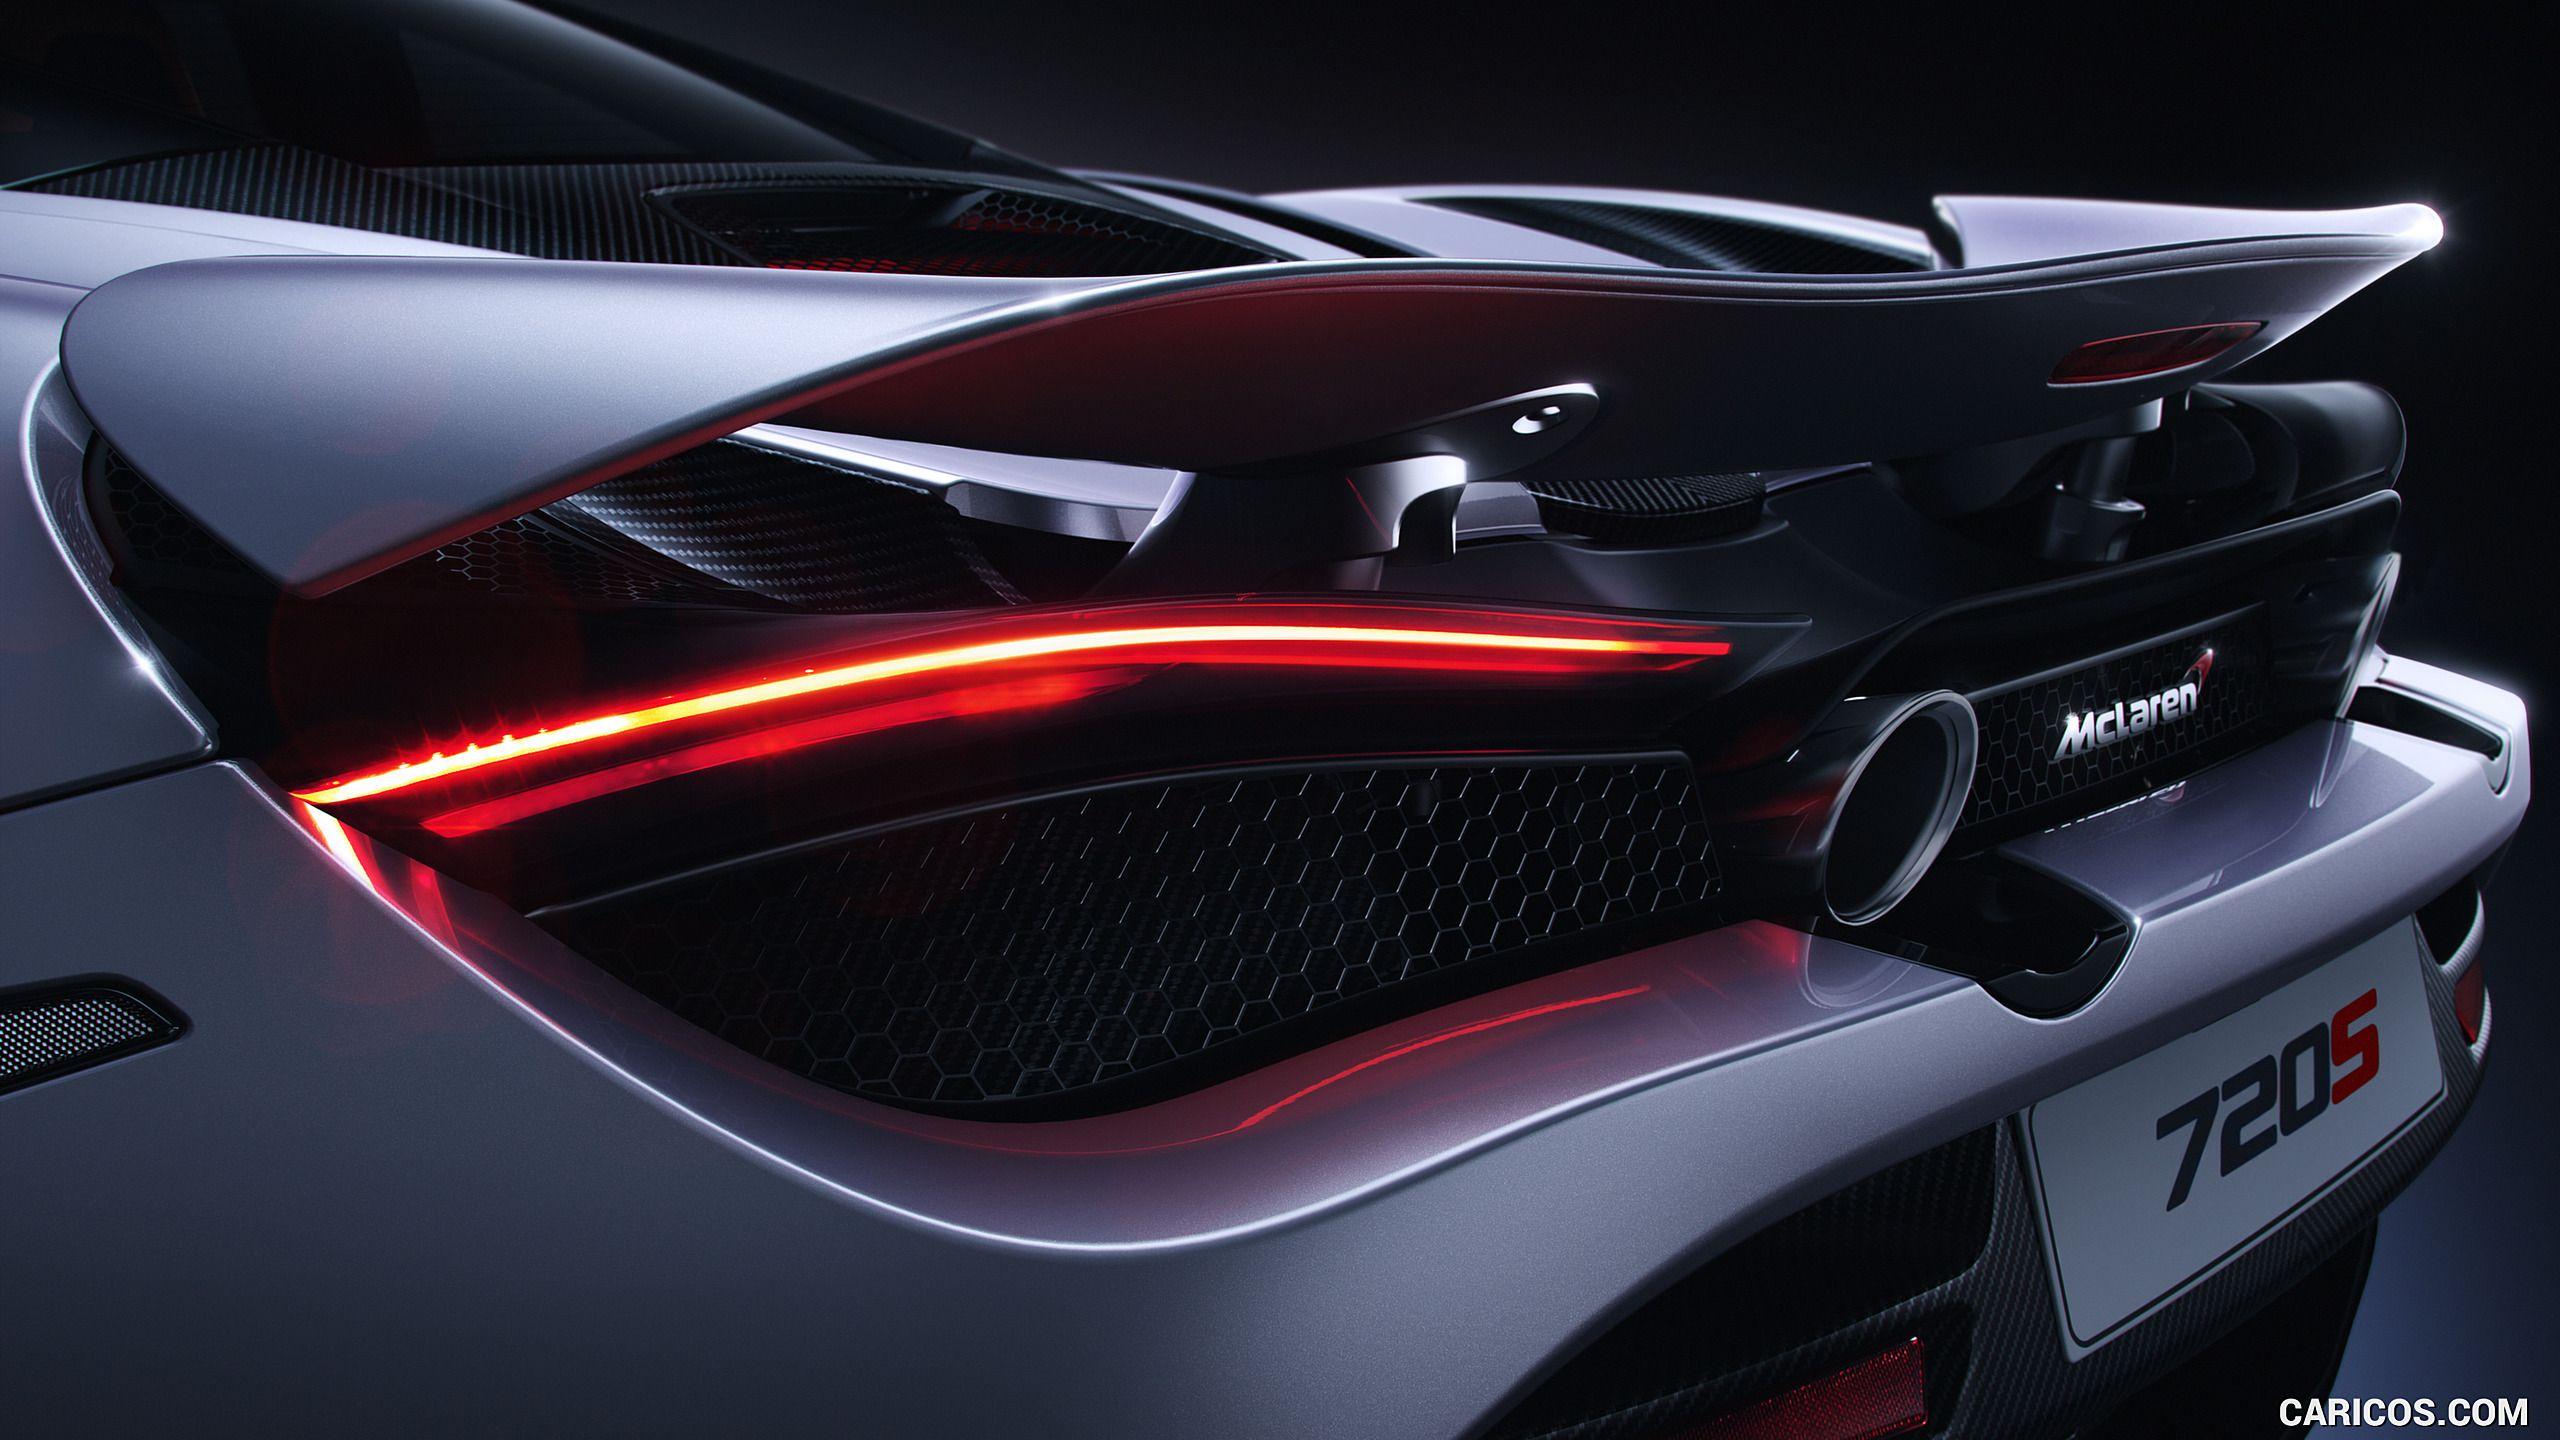 2018 Mclaren 720s Wallpaper Super Cars Mclaren Cars Mclaren